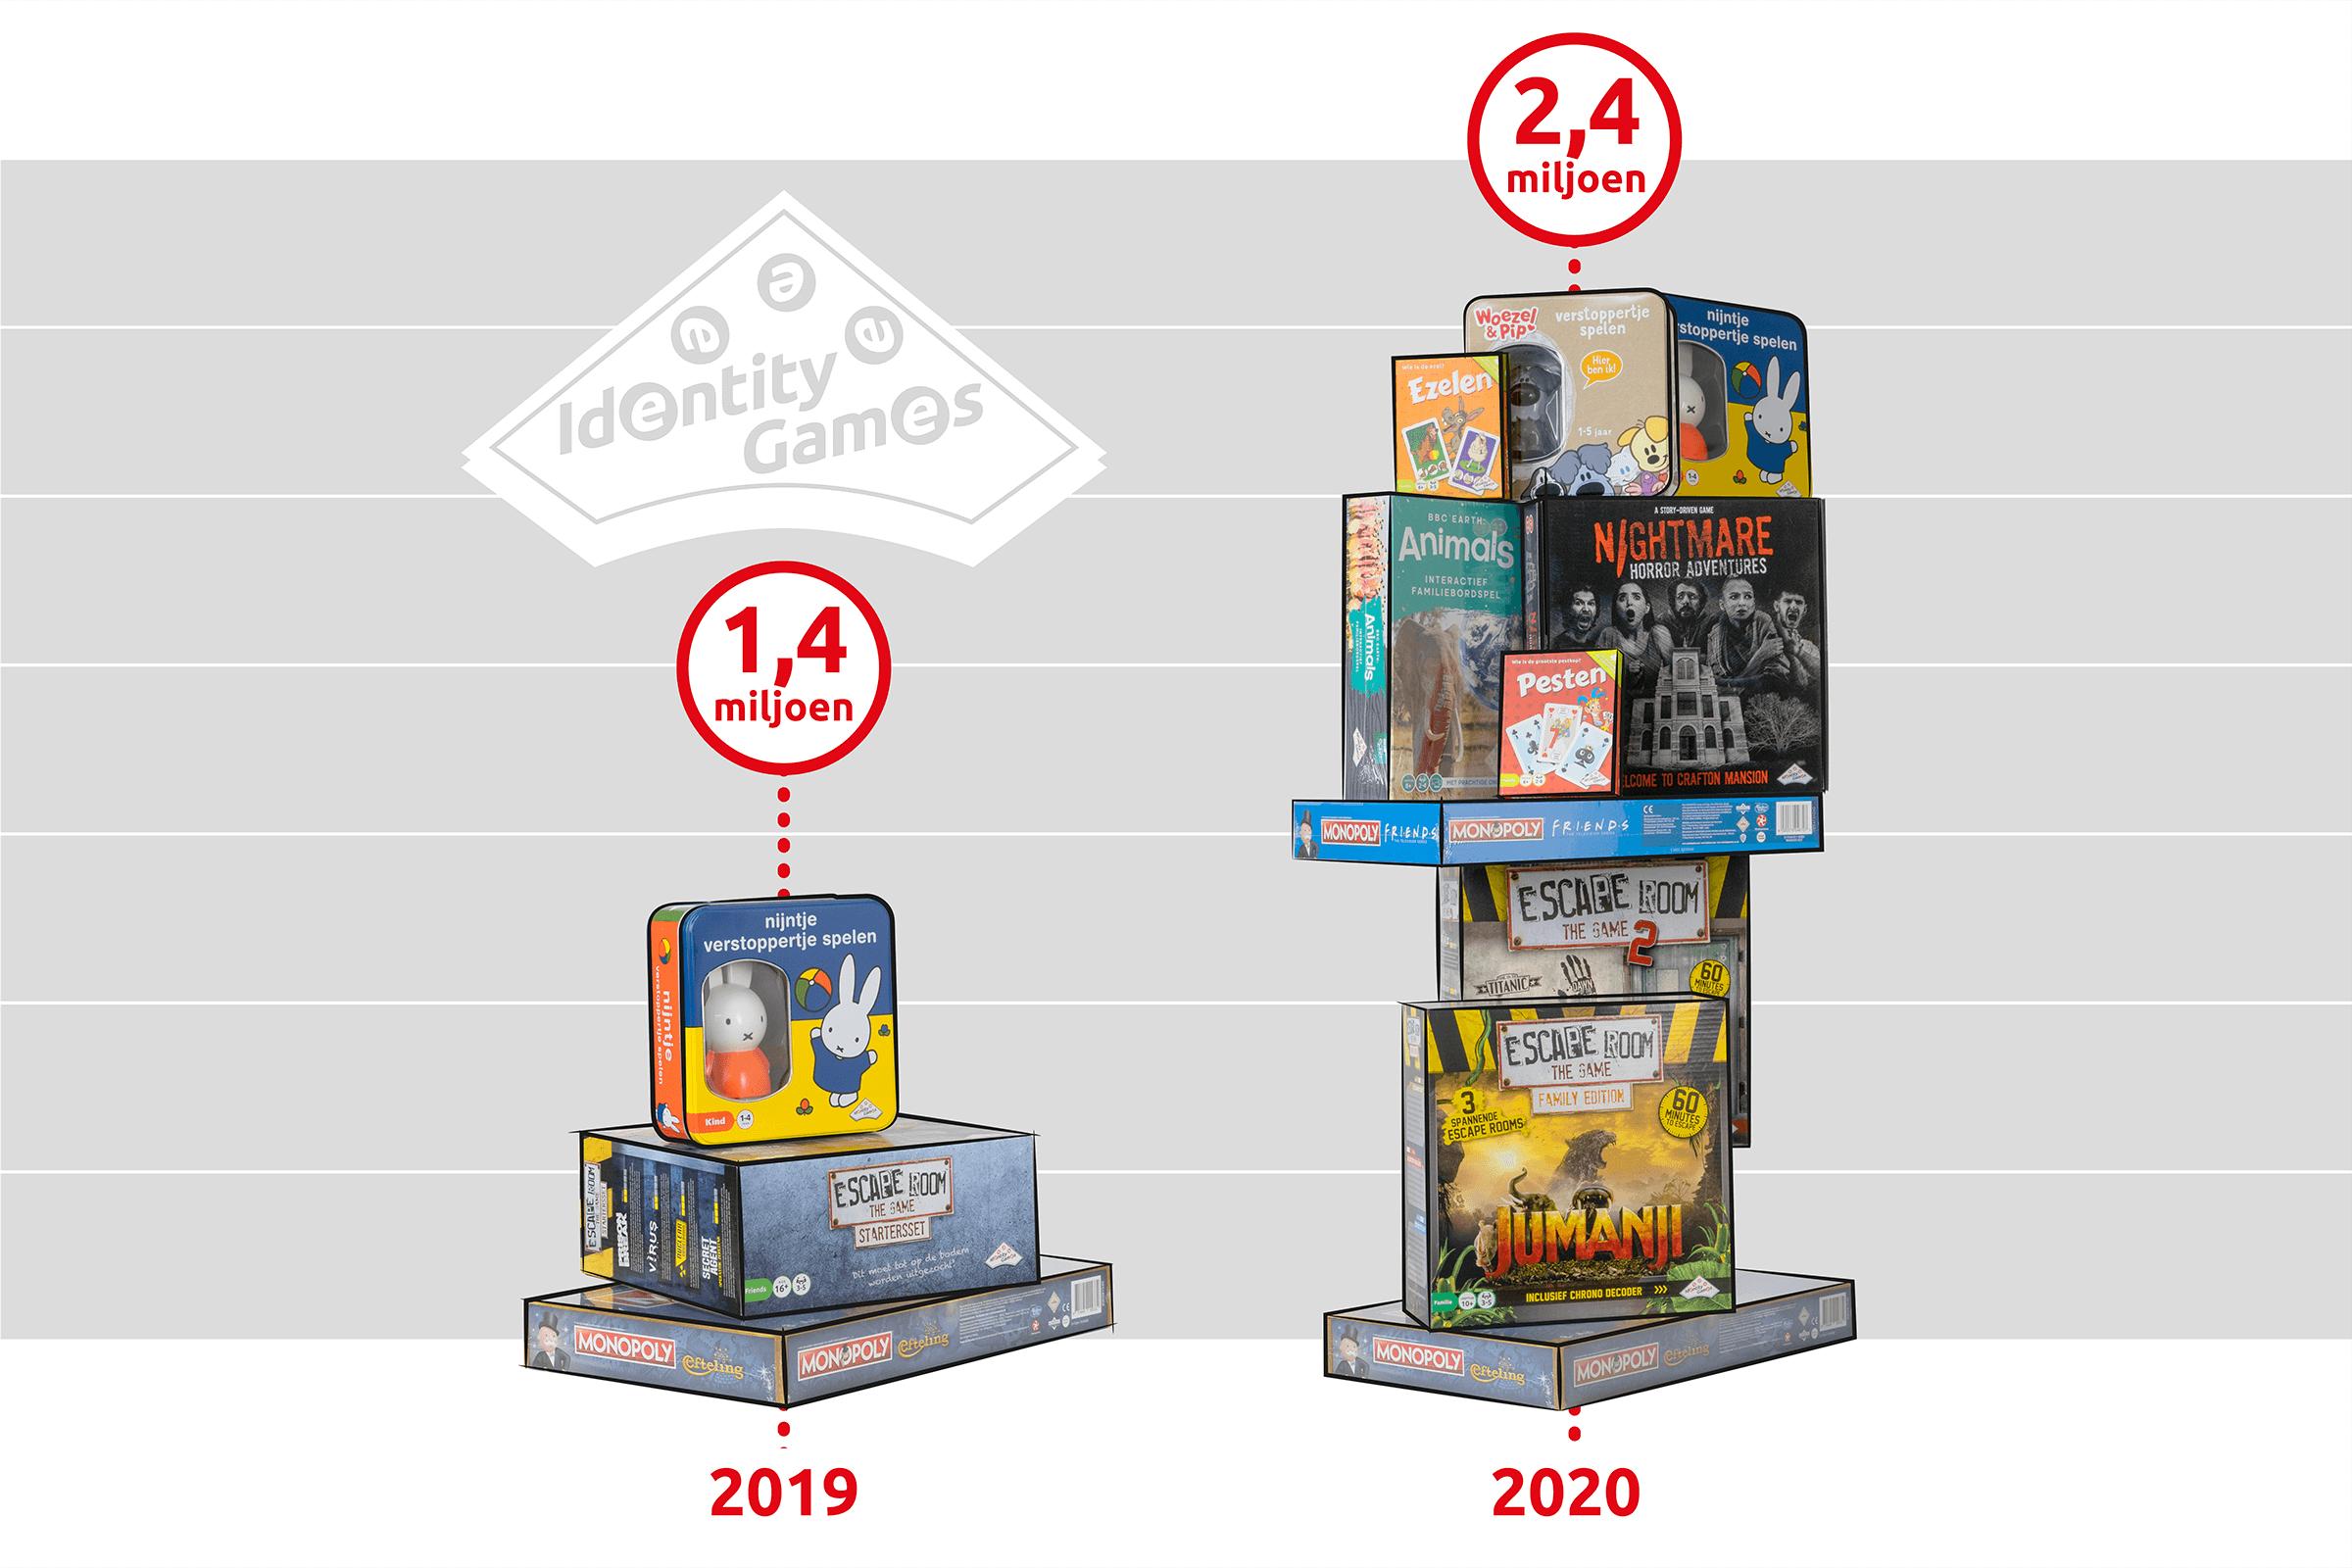 Groeicijfers 2020